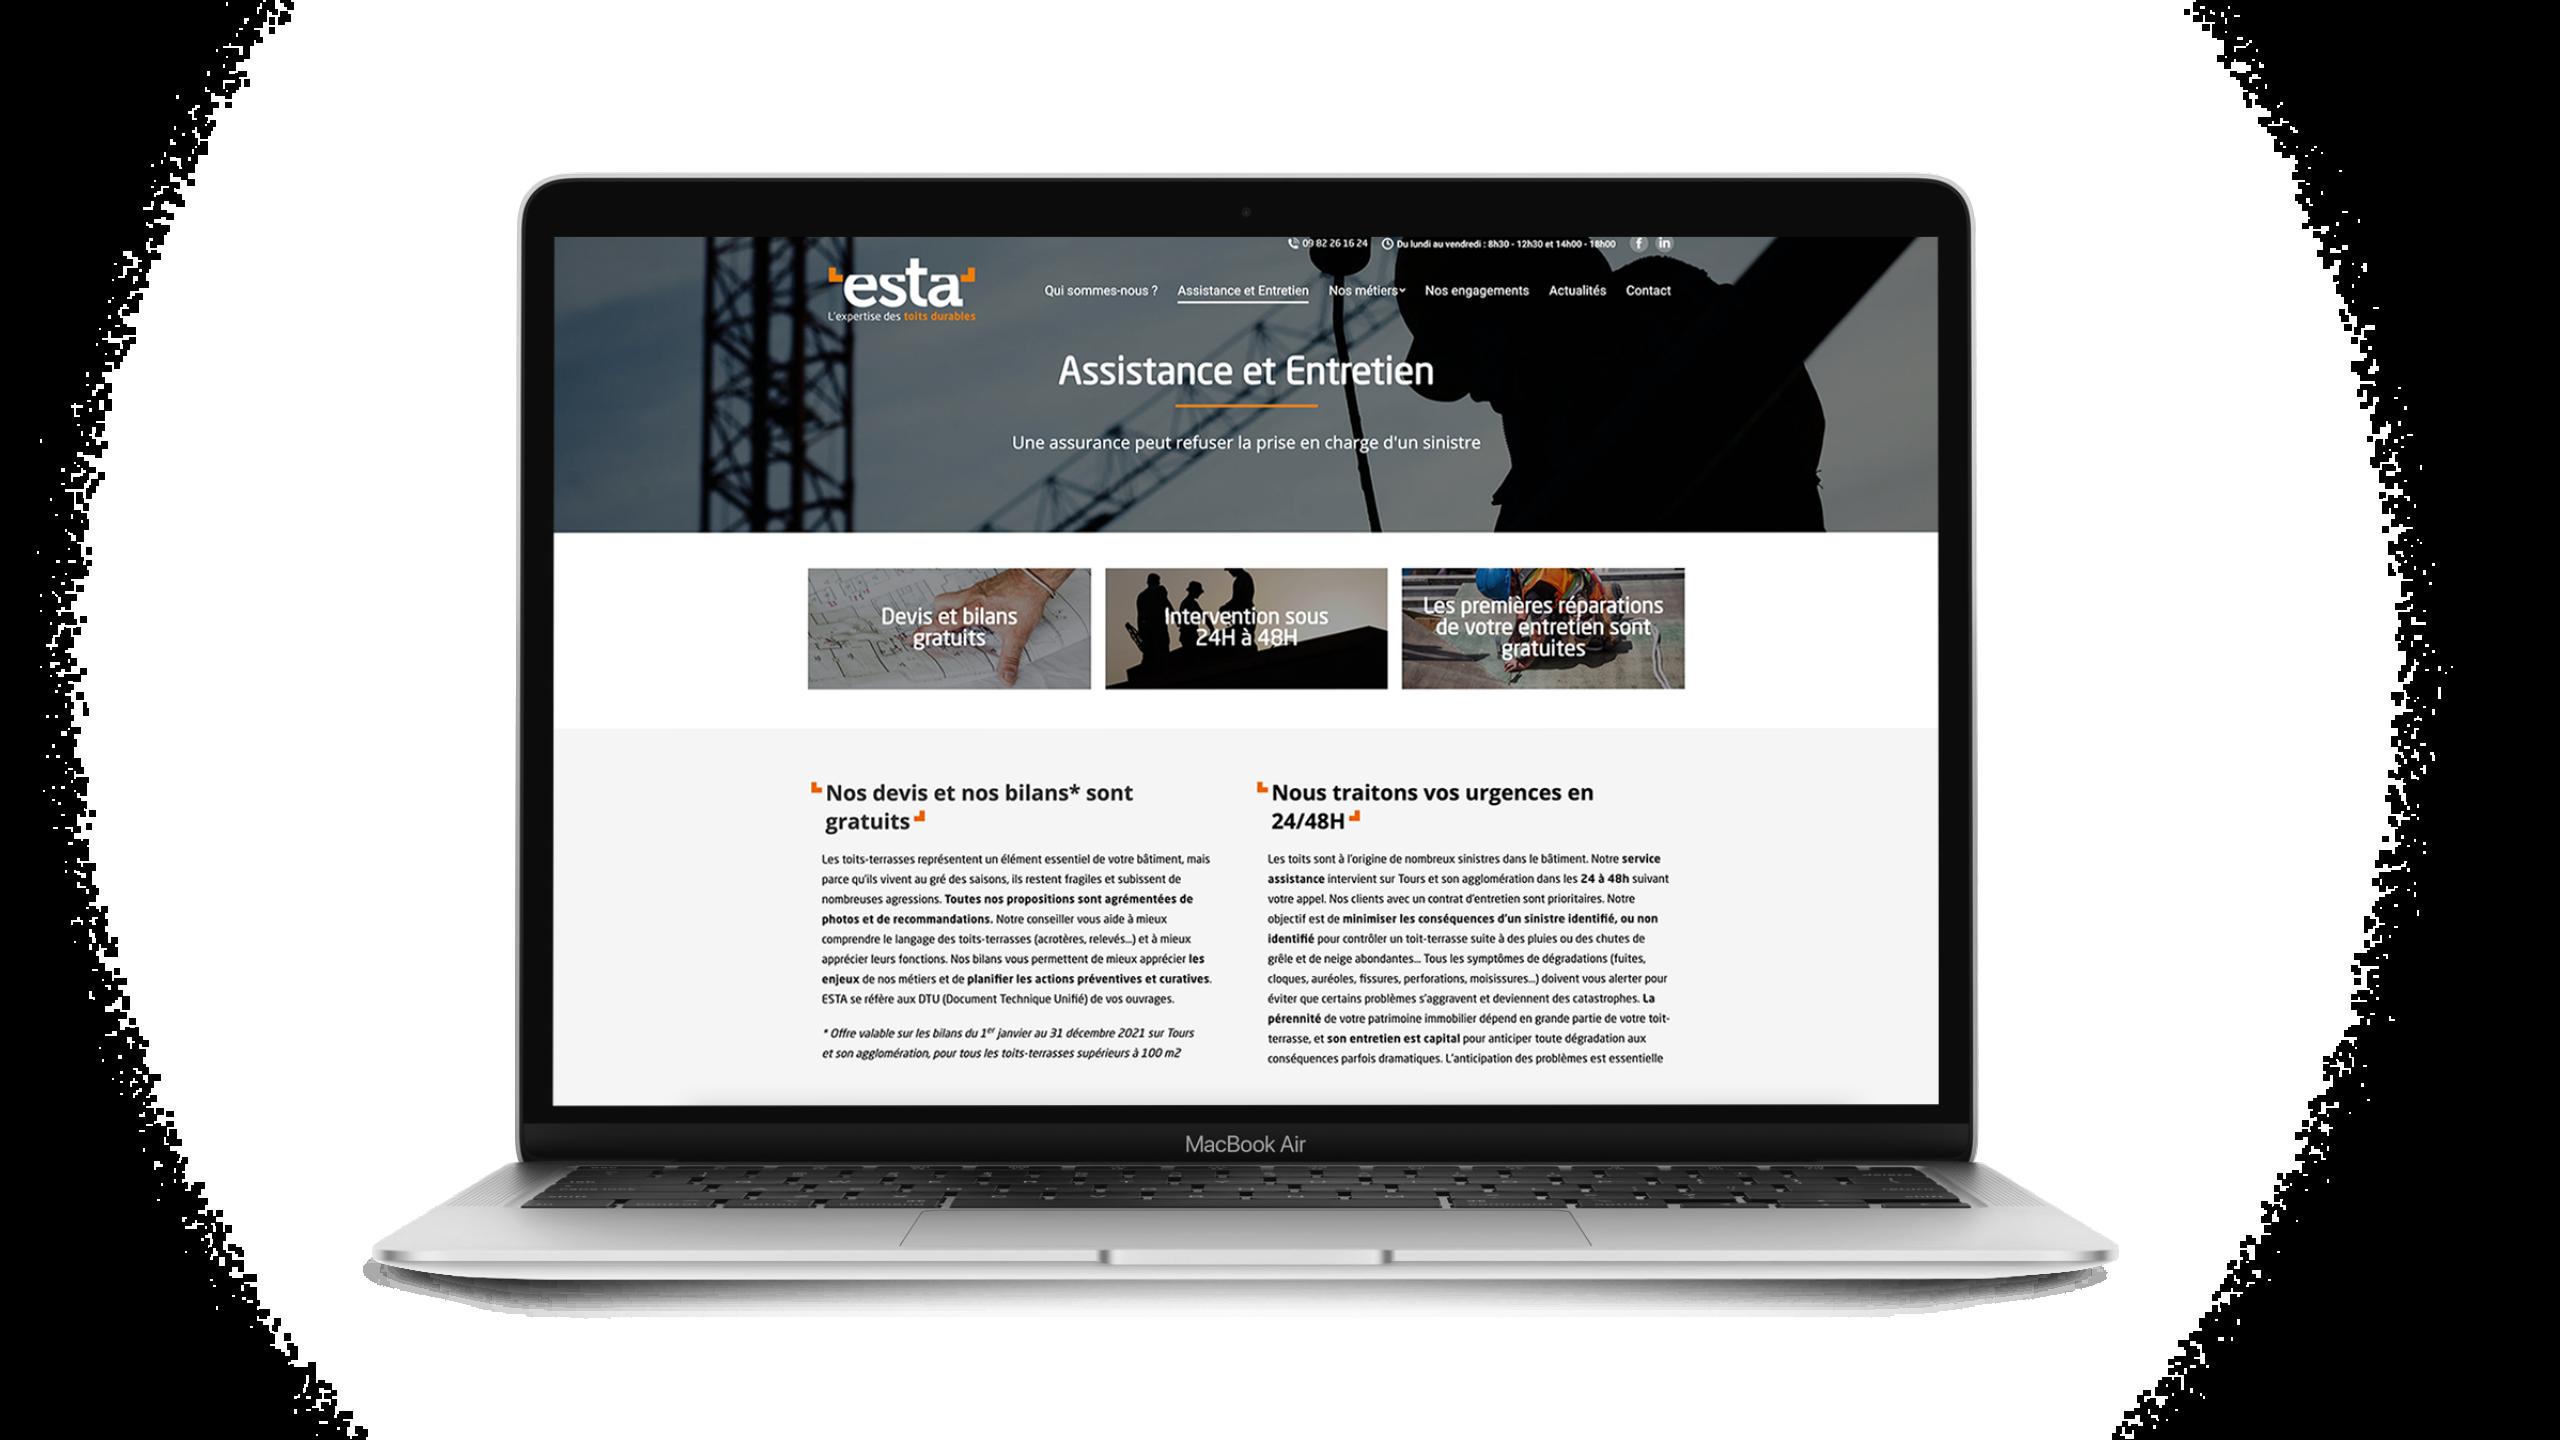 image-digital-ESTA-site-web-agence-conseil-en-communication-Letb-synergie